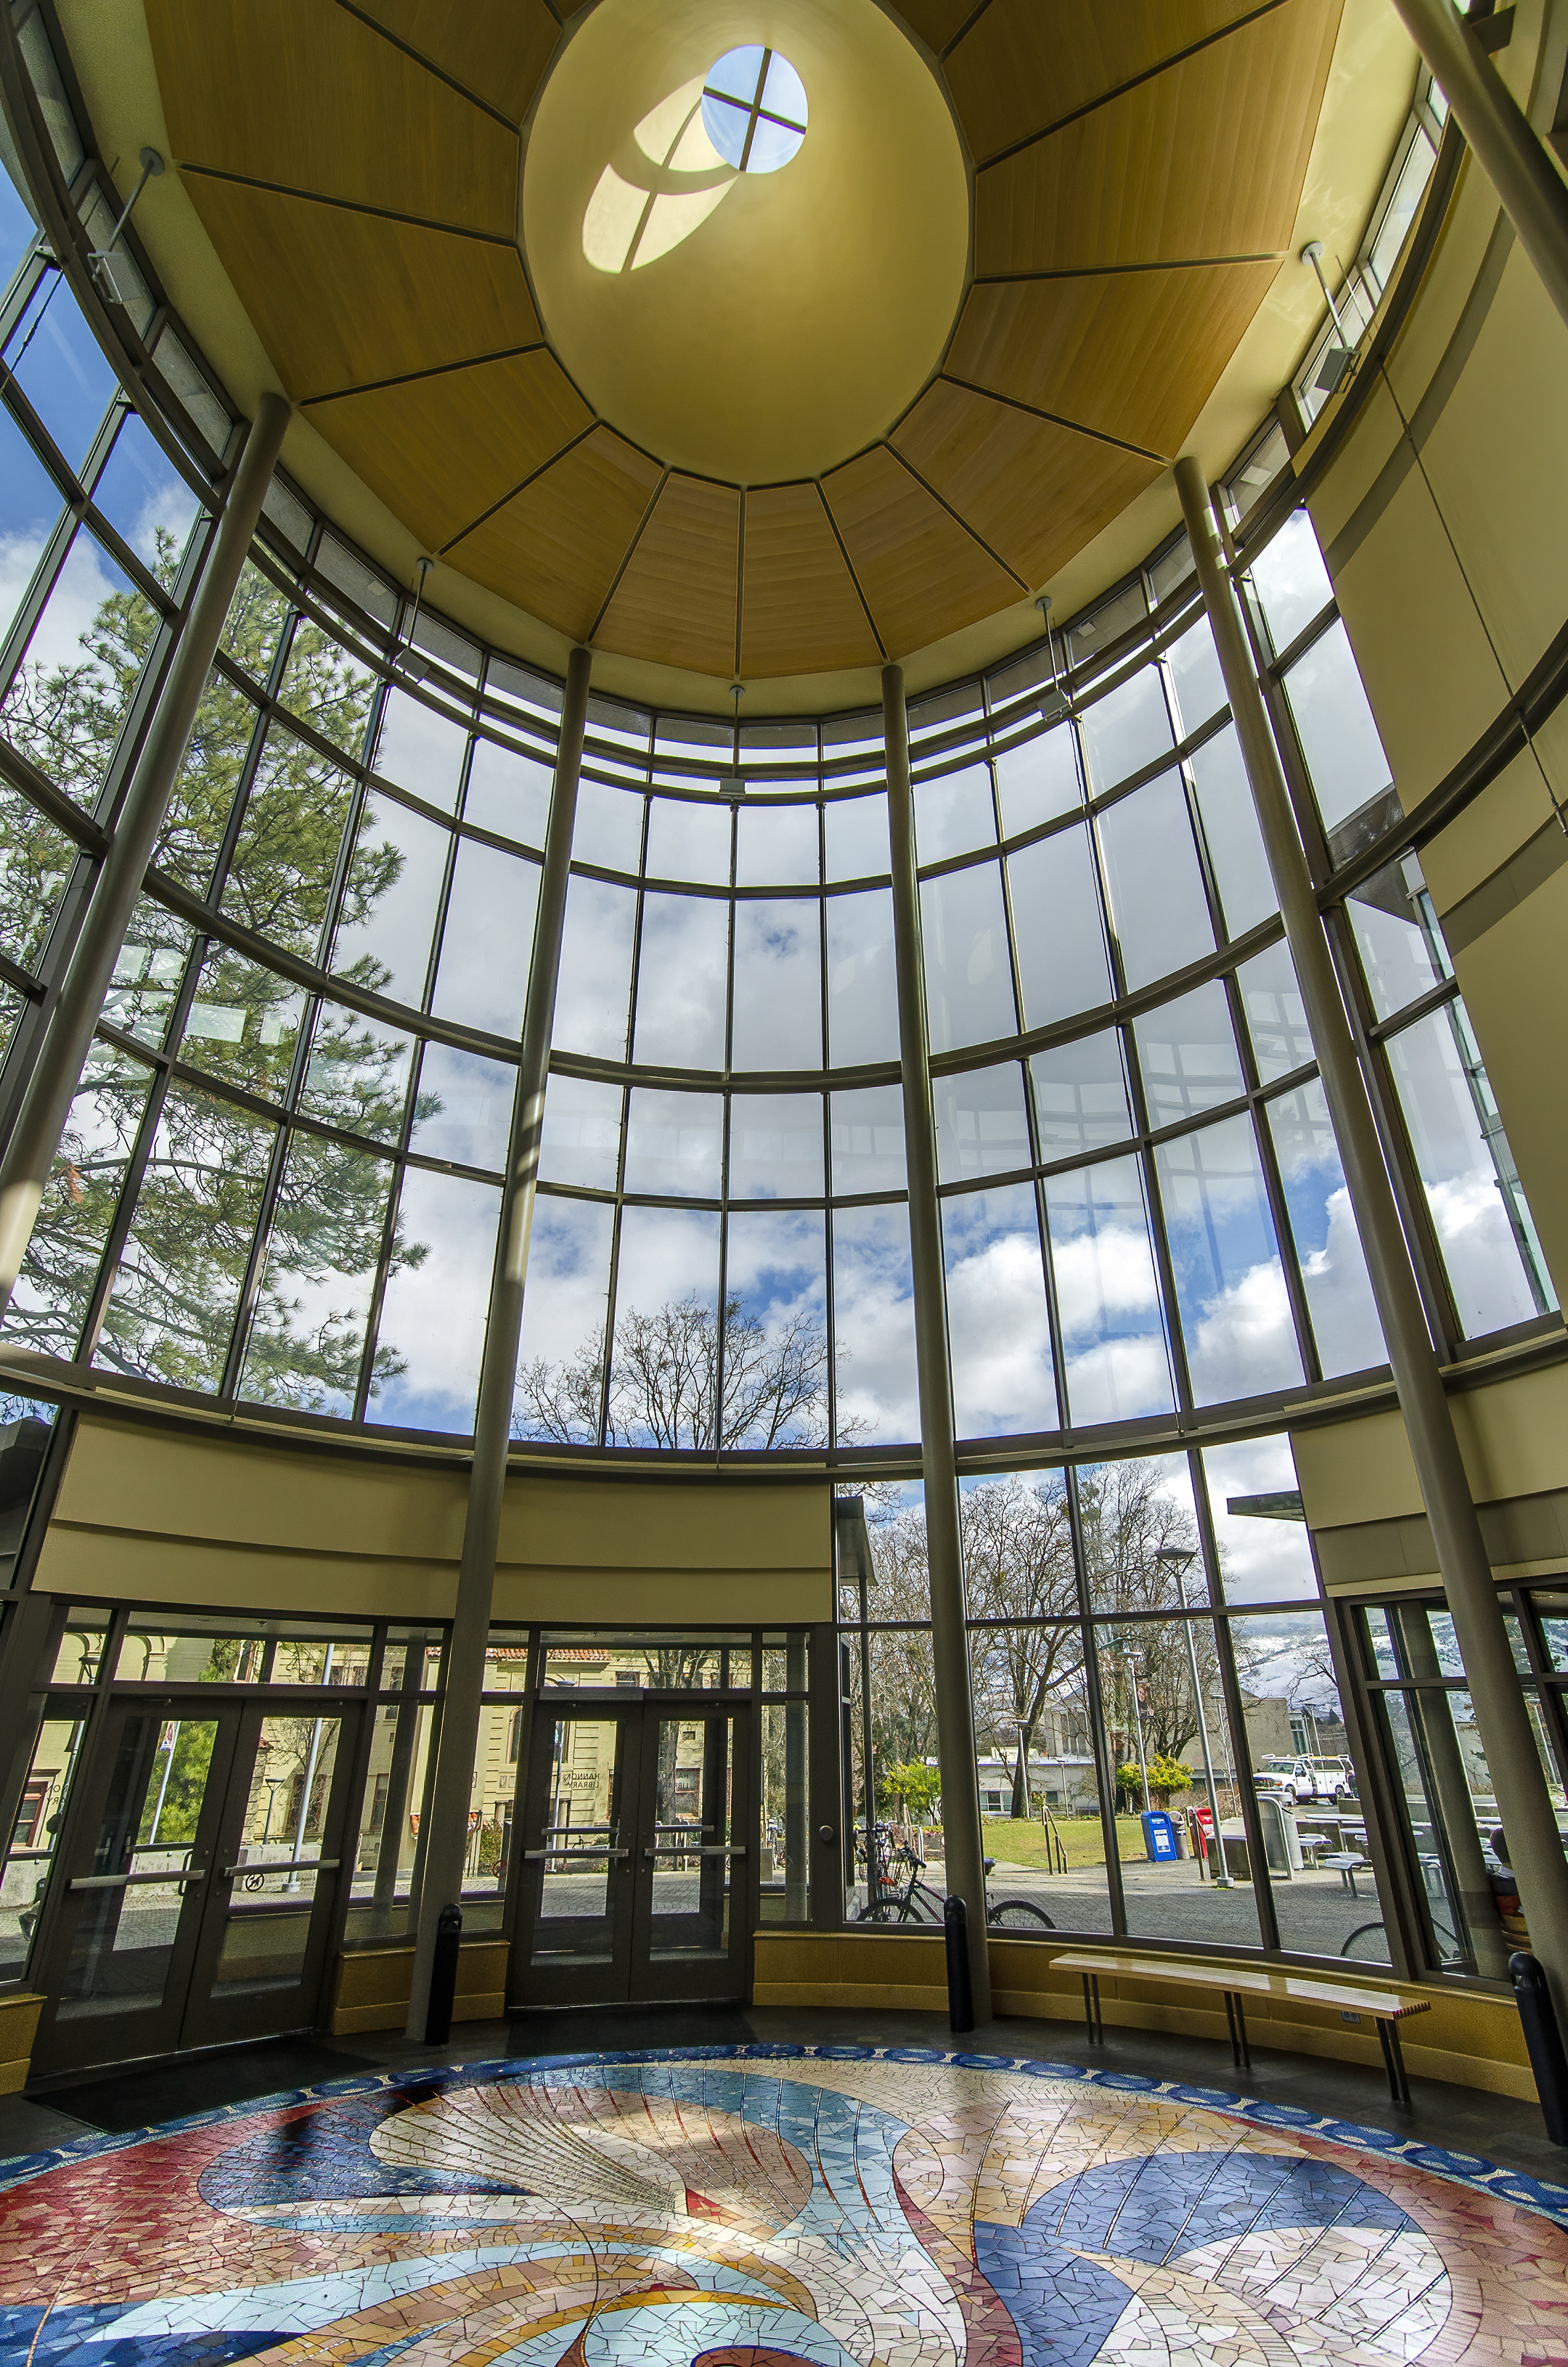 sou campus ashland Hannon Library Rotunda atrium